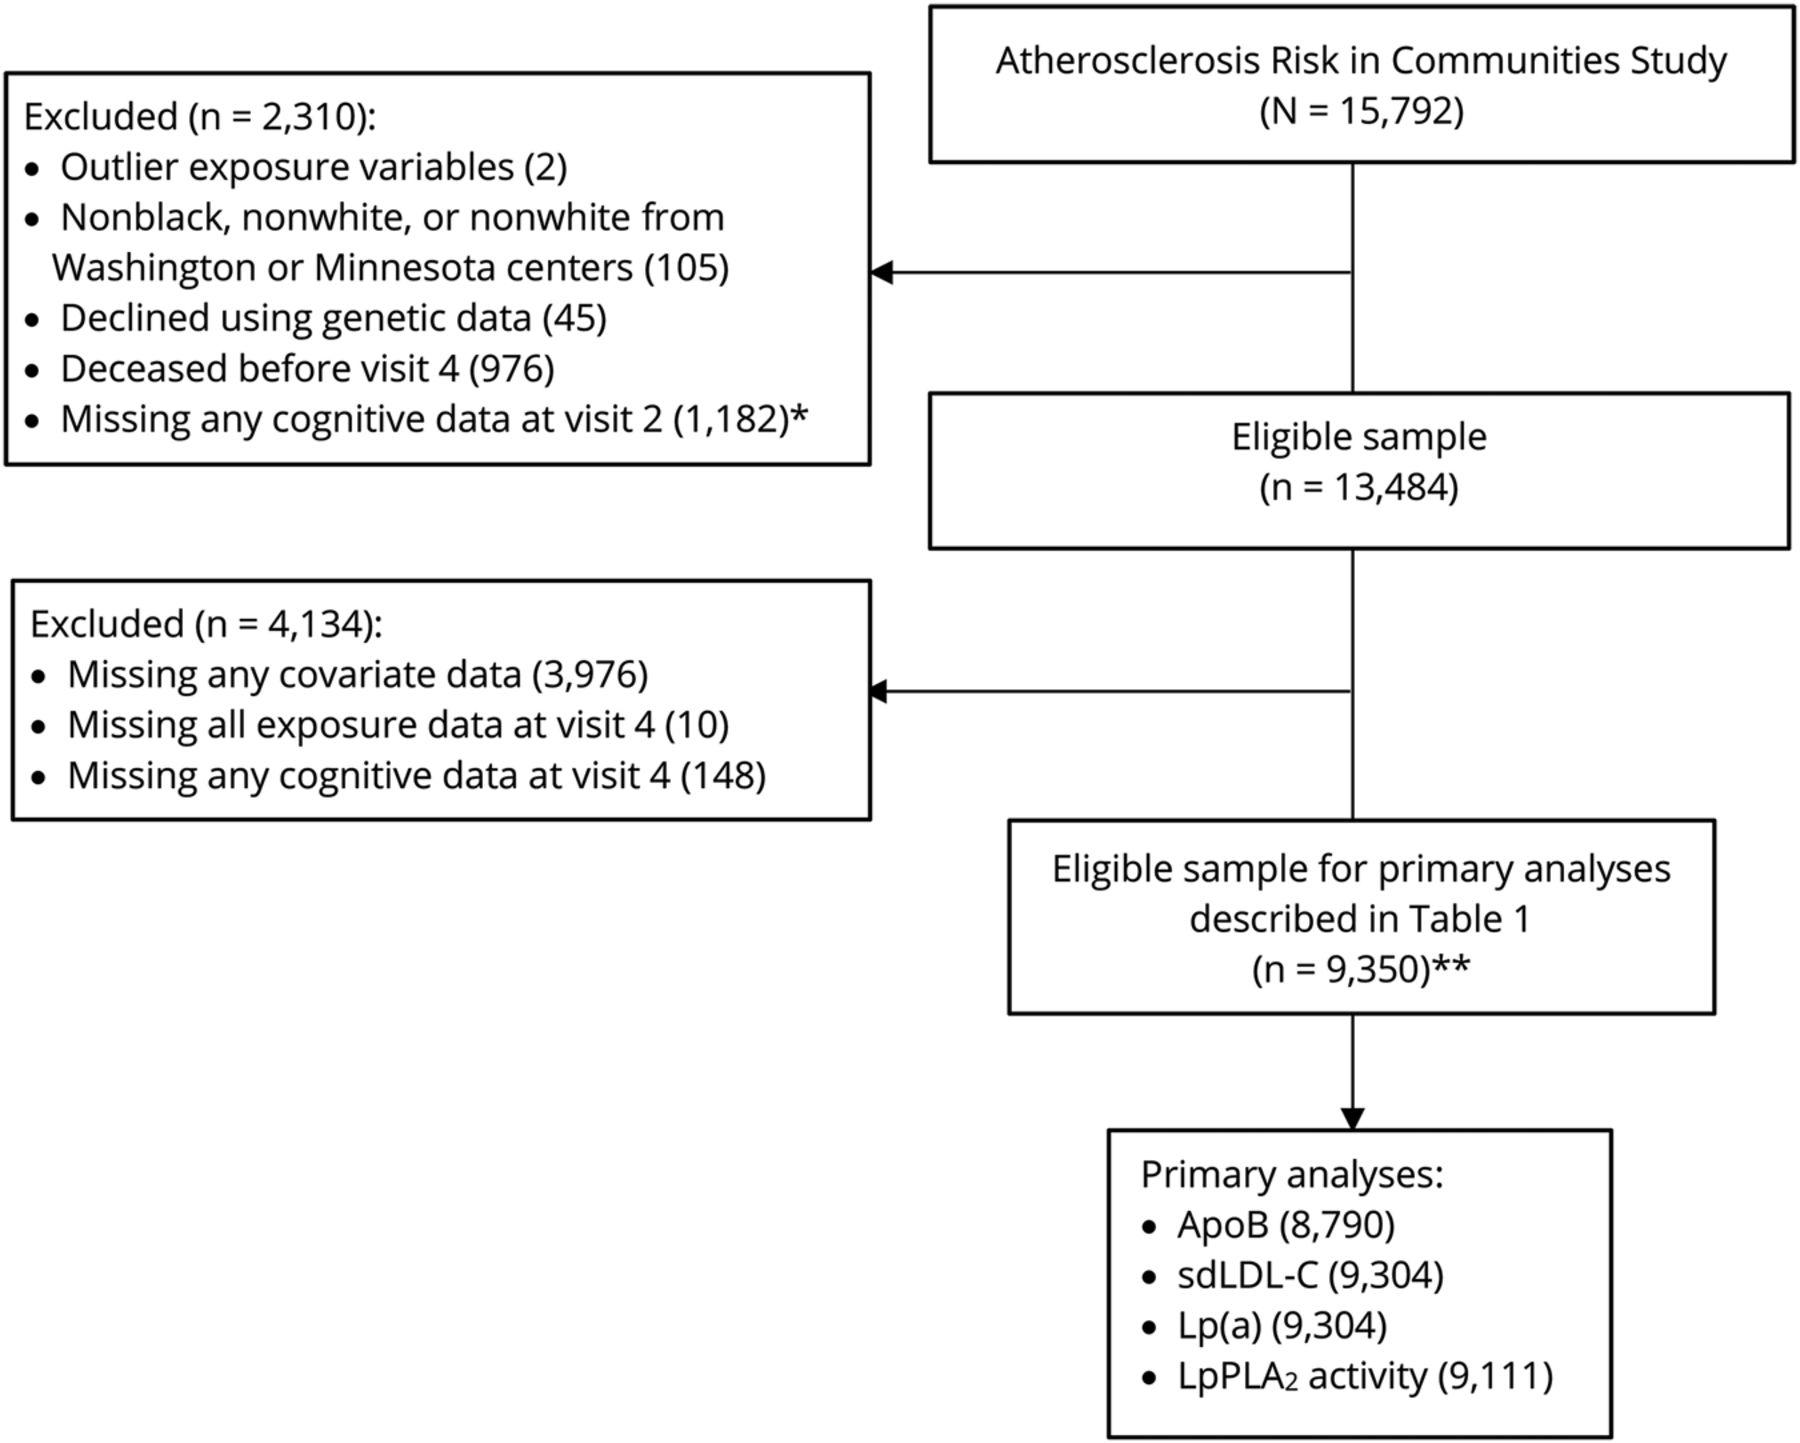 ApoB, small-dense LDL-C, Lp(a), LpPLA2 activity, and